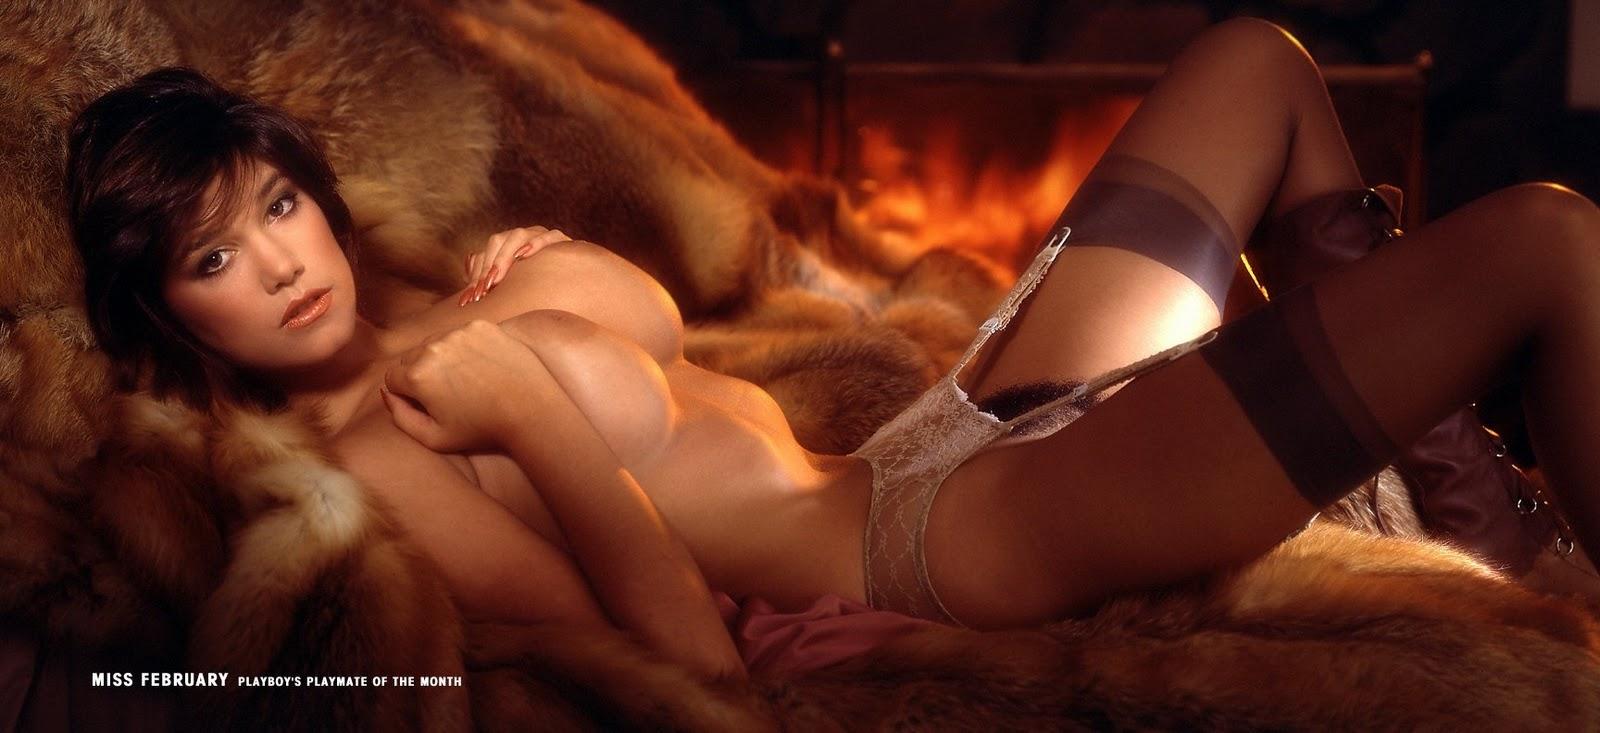 nude centerfolds Vintage playboy